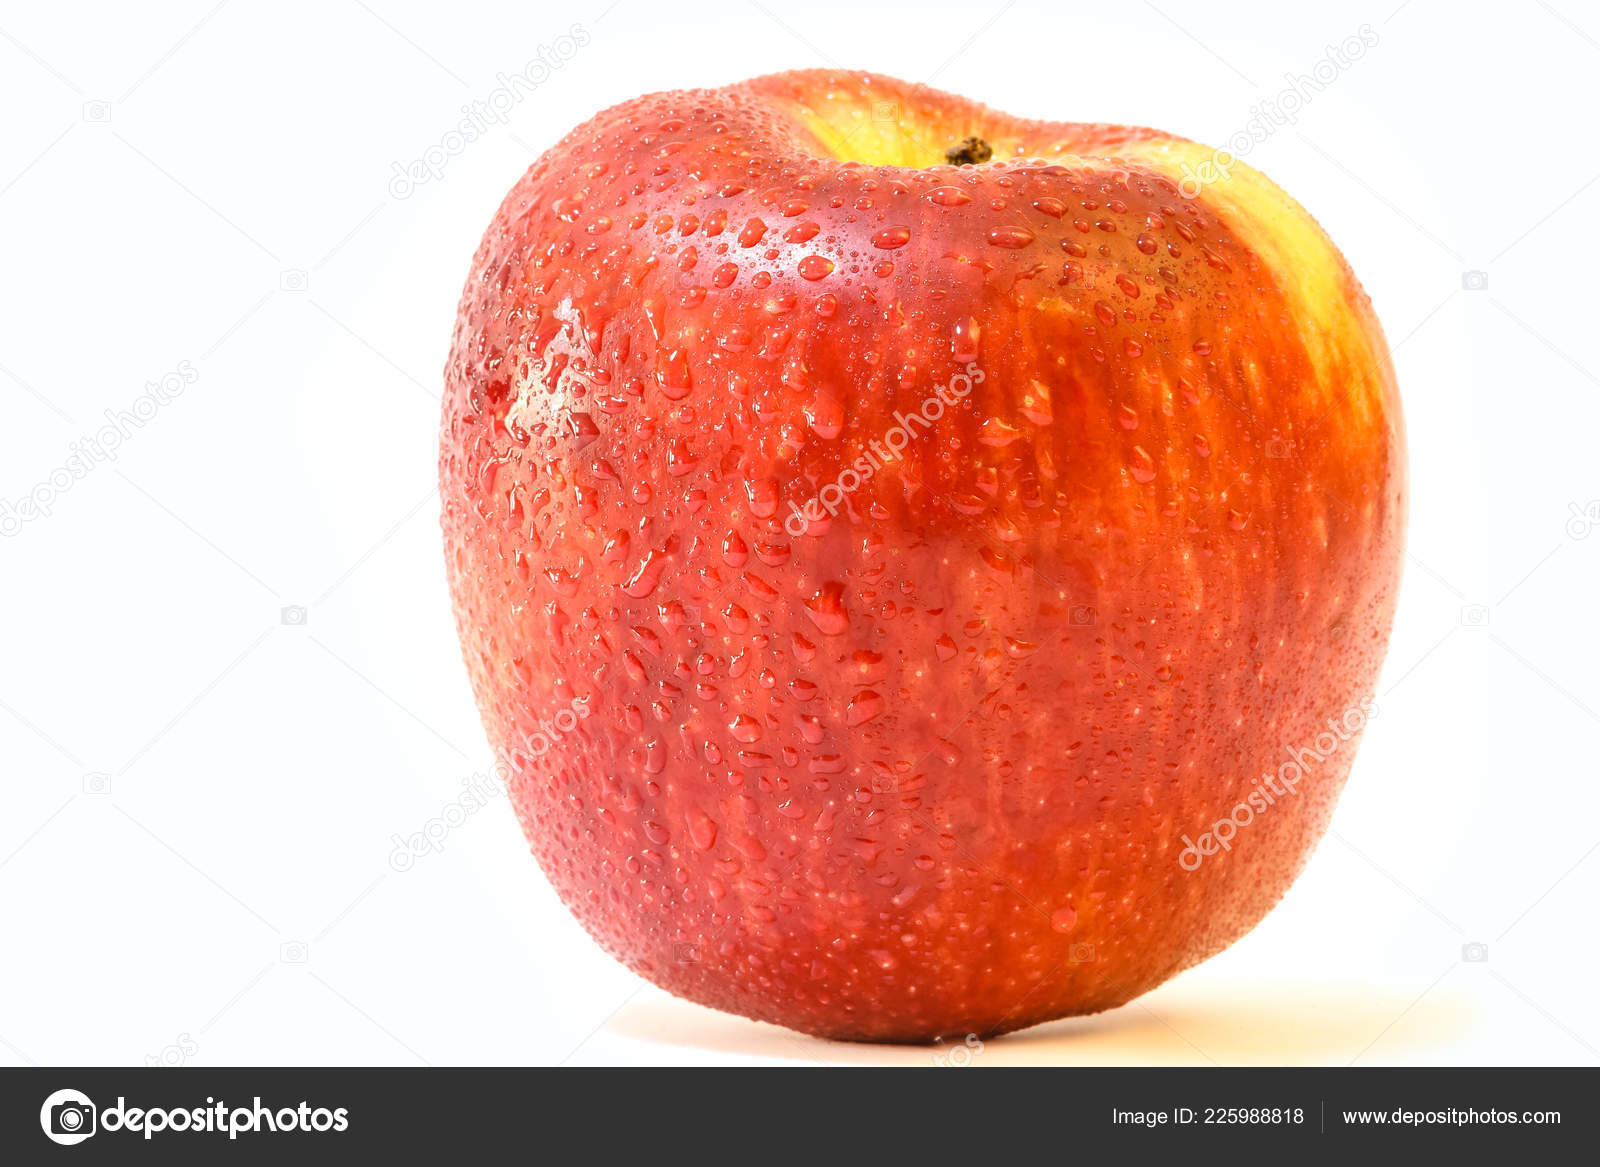 photoshop download apple free